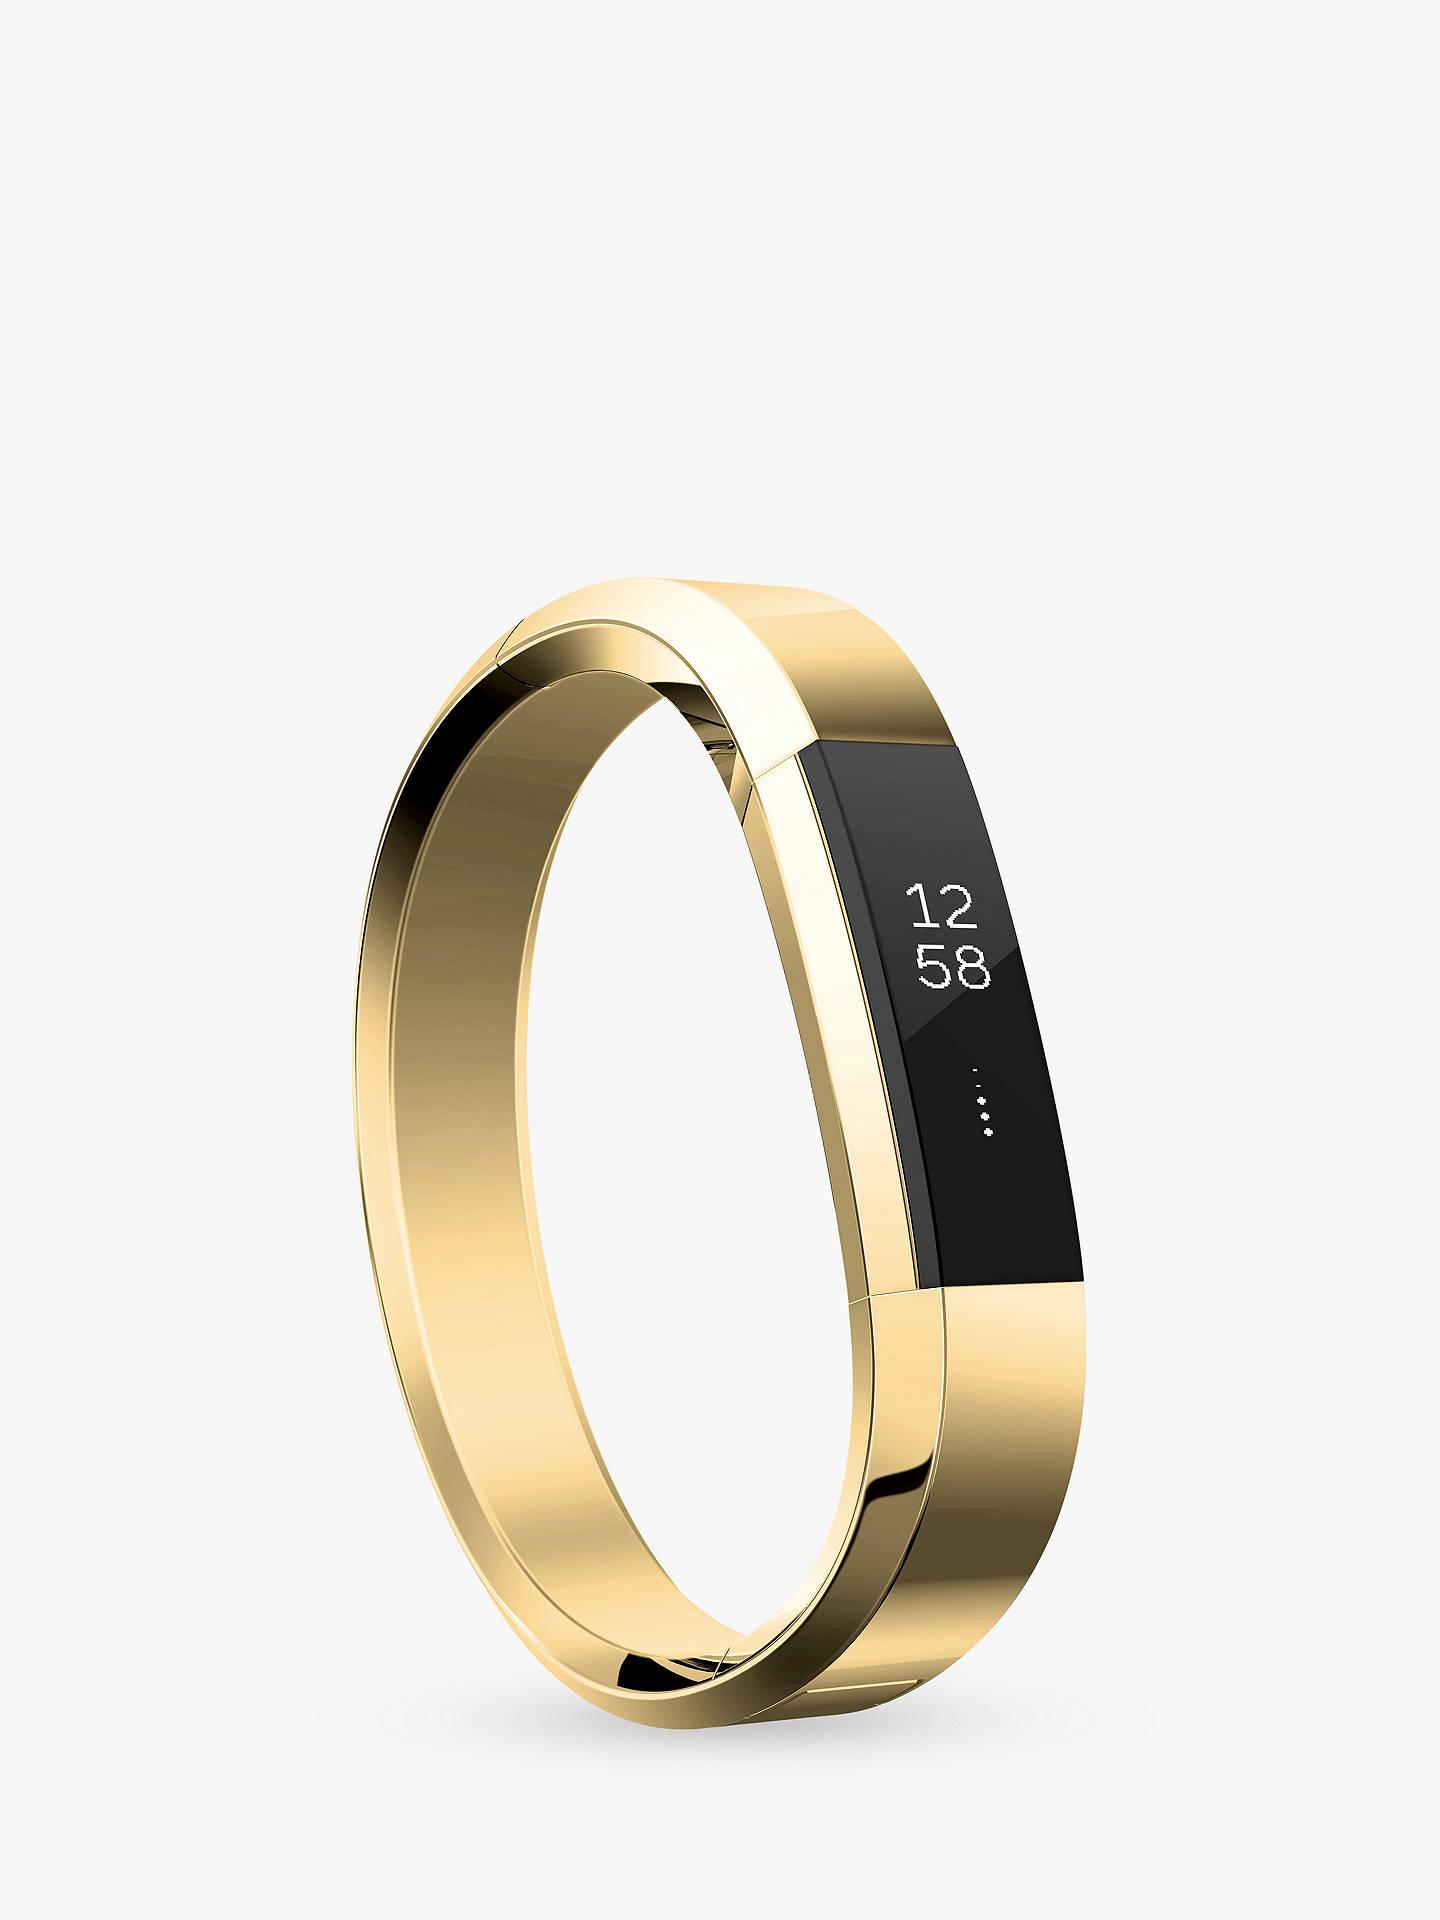 15ea05b5da281 Fitbit Alta Metal Bracelet Wristband, Stainless Steel, Gold